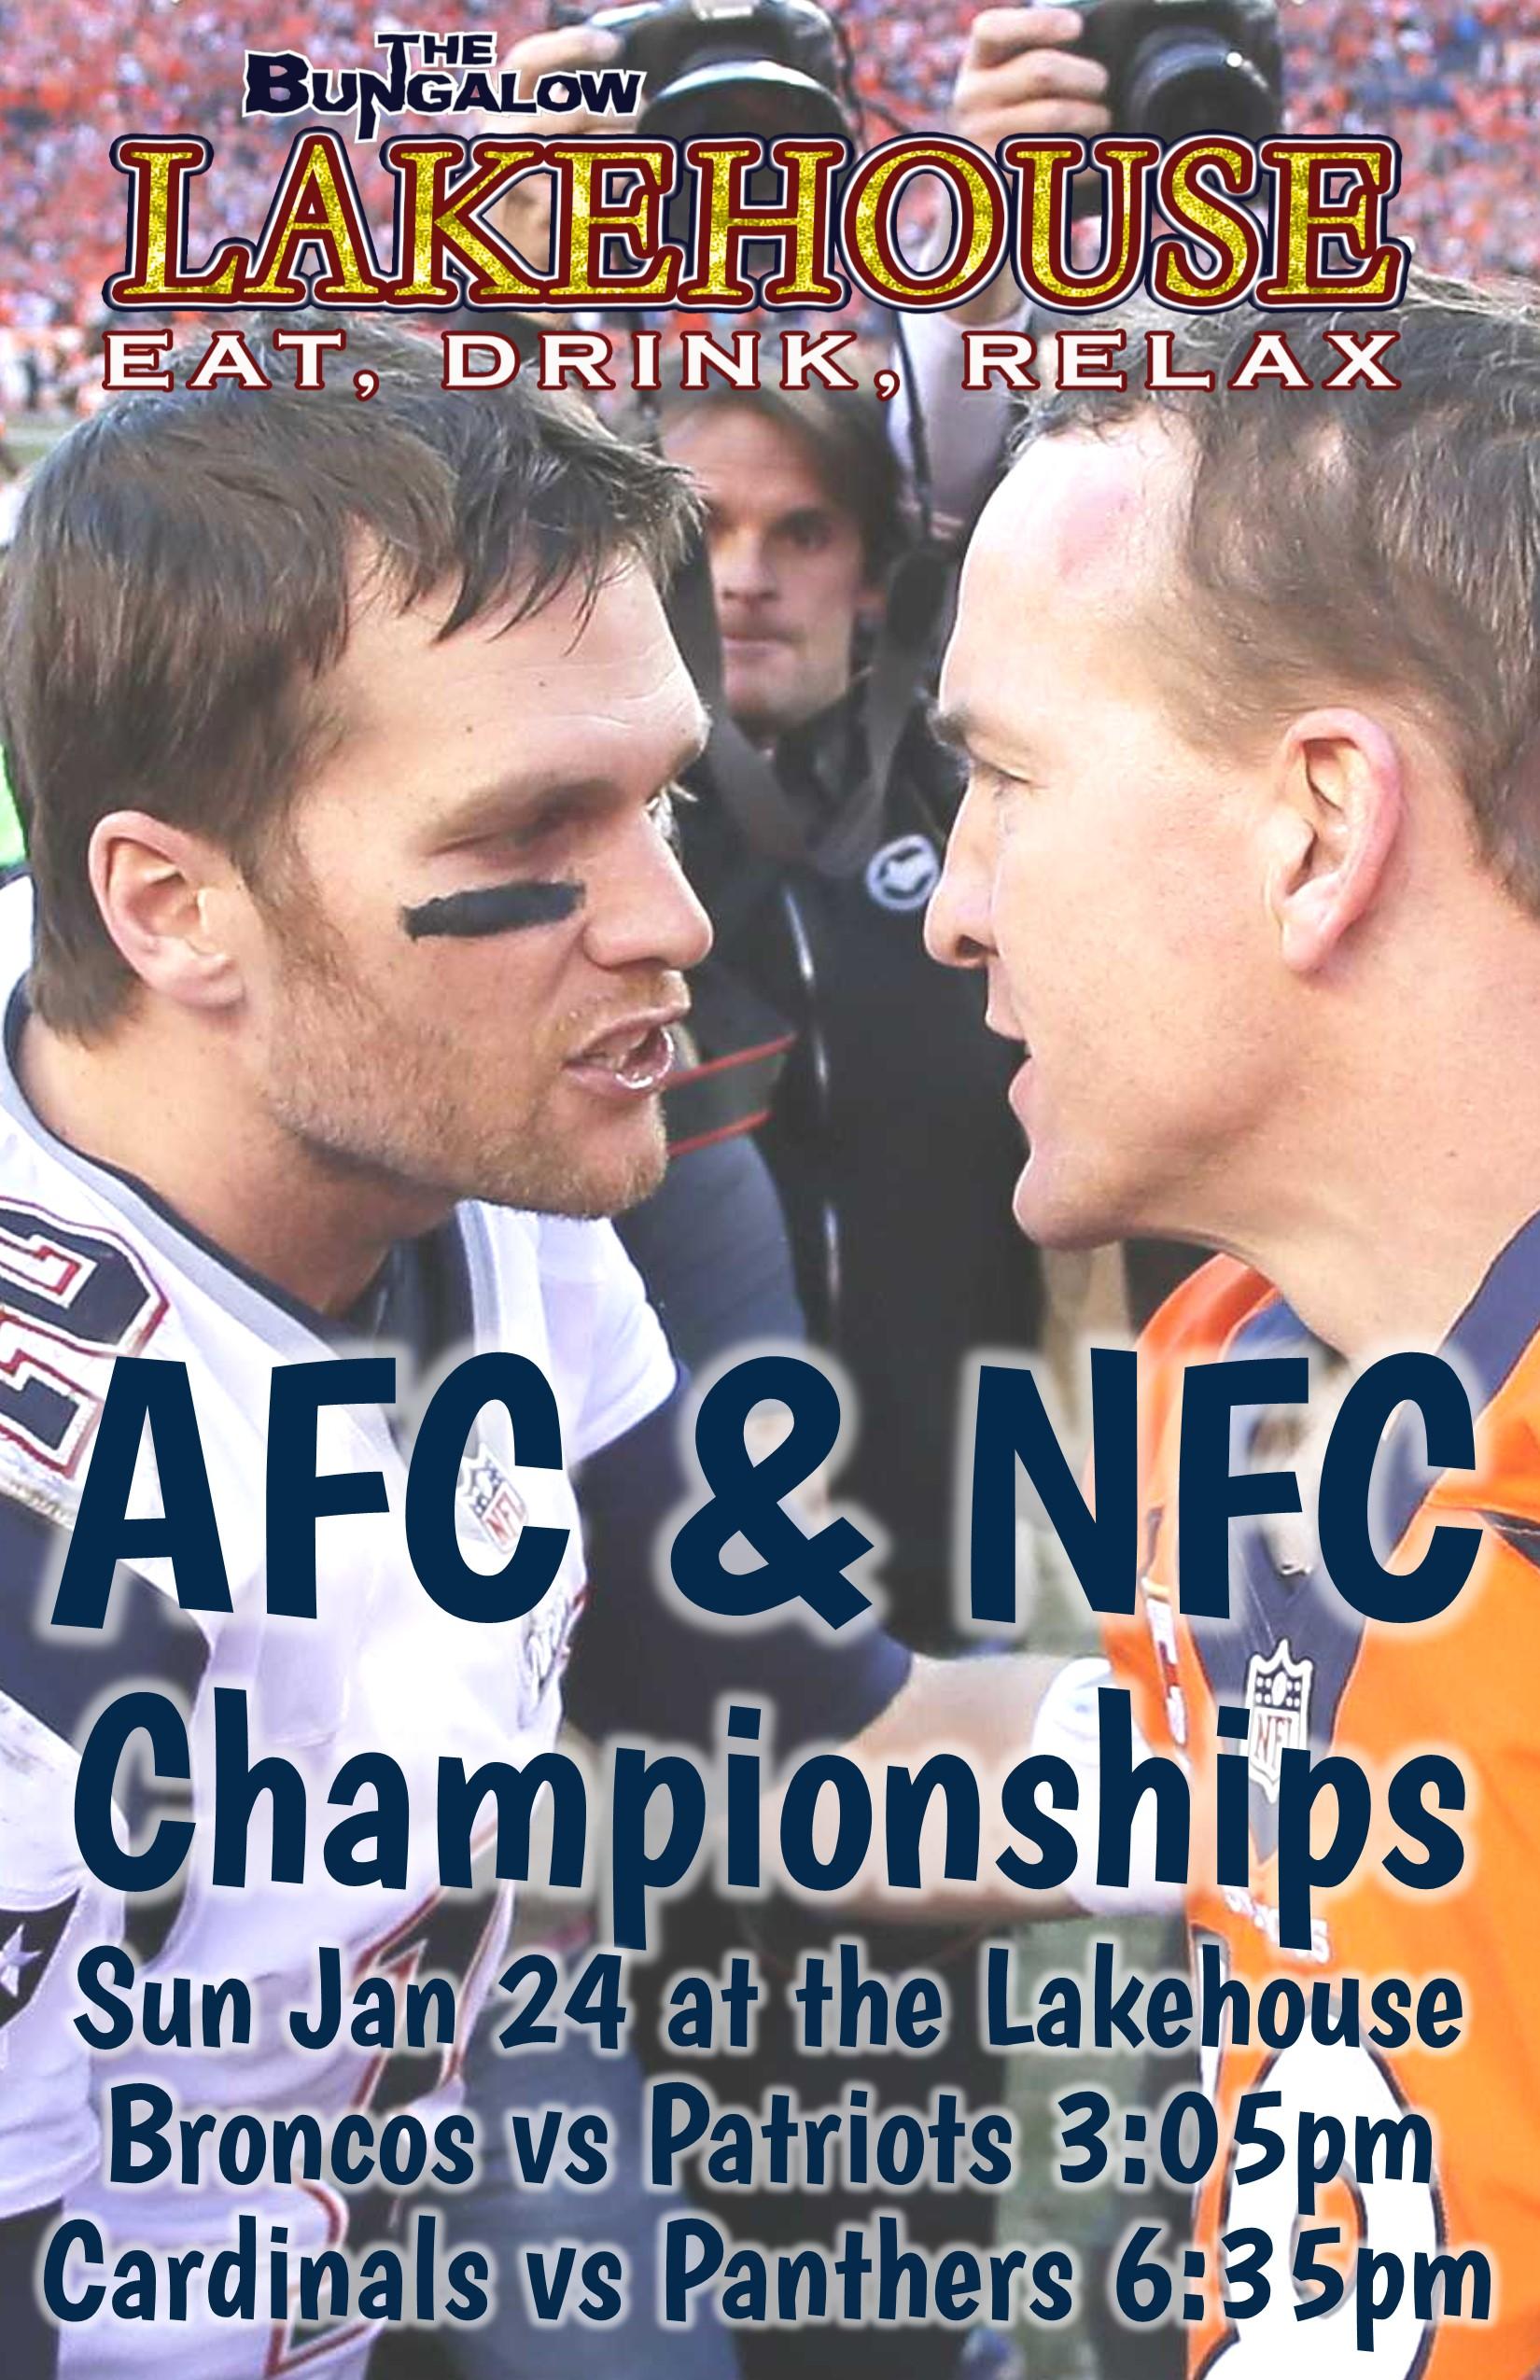 Broncos vs Patriots Lakehouse 2015